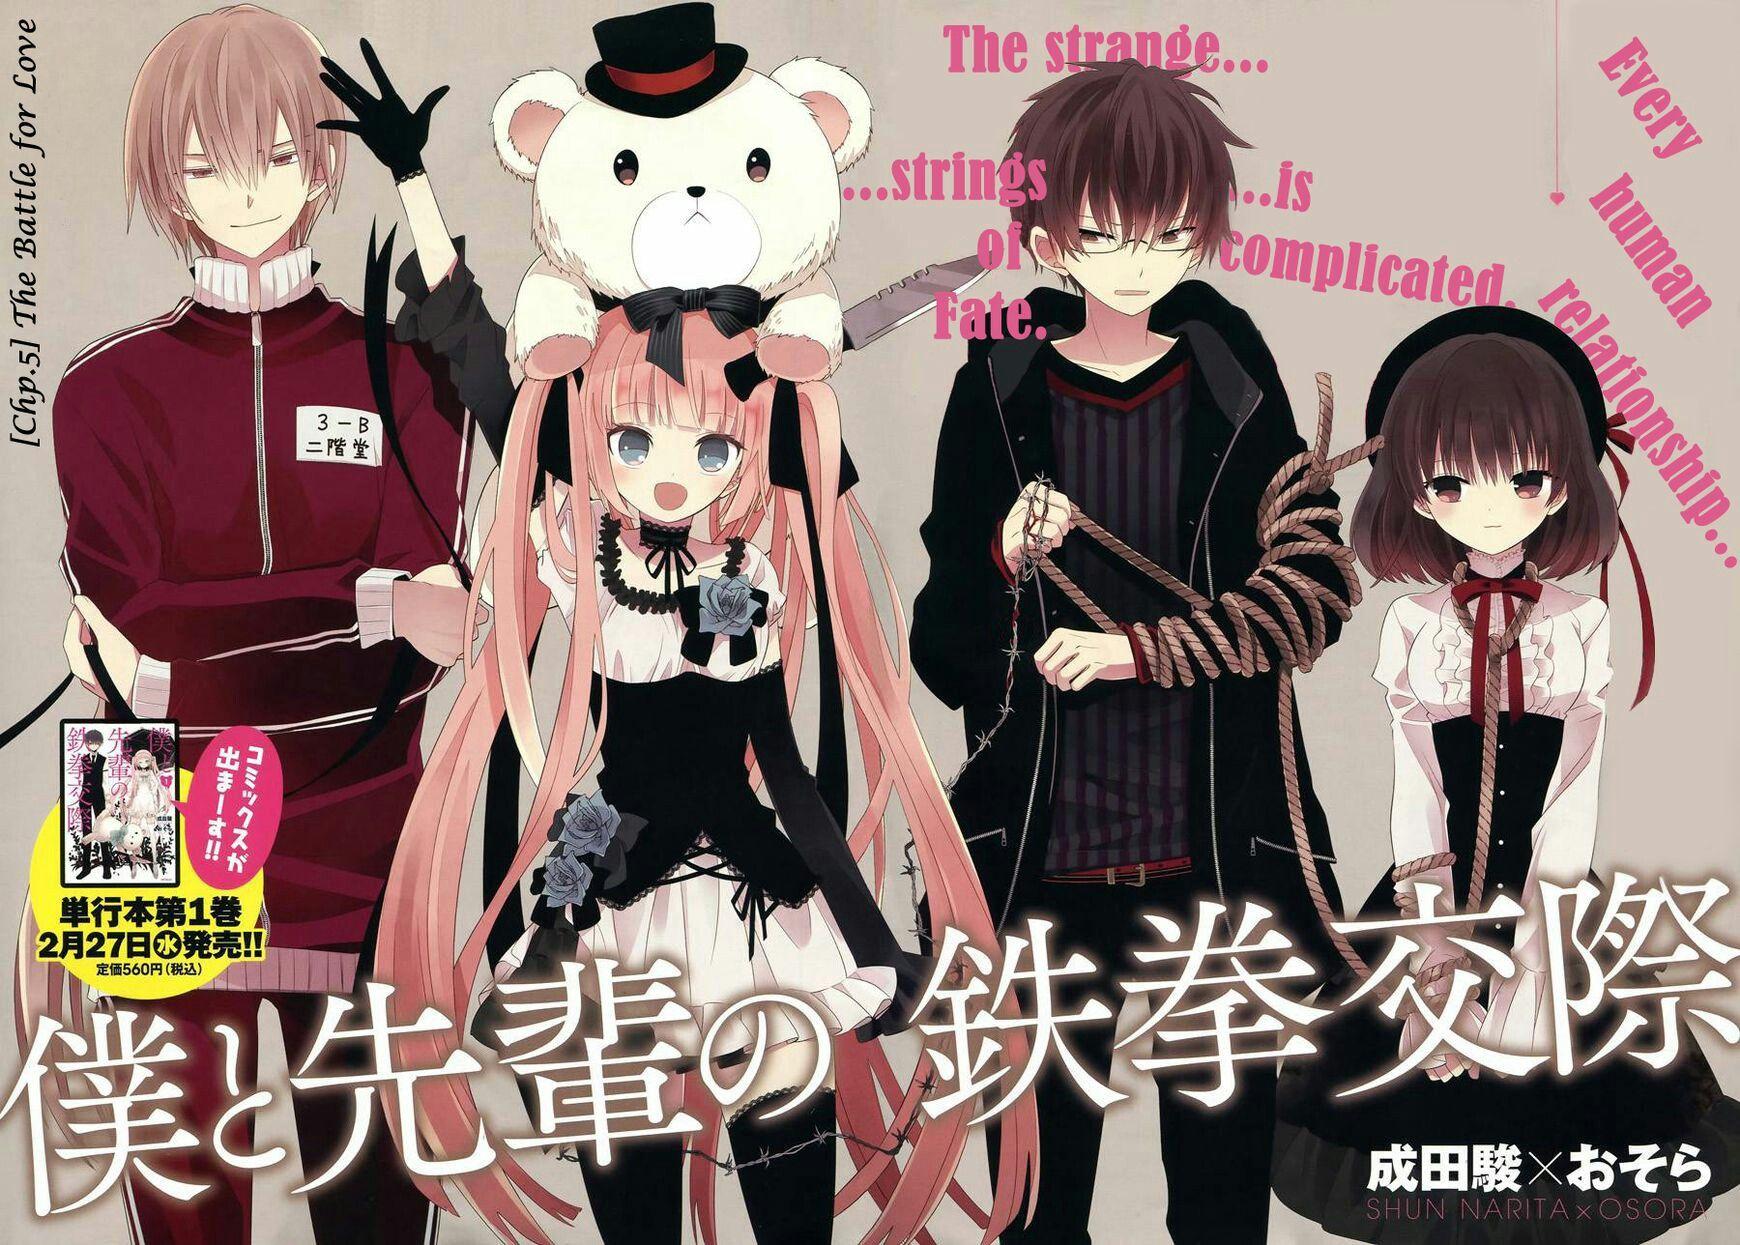 Anime Action Romance Gore Manga Comedy Psychology Boku To